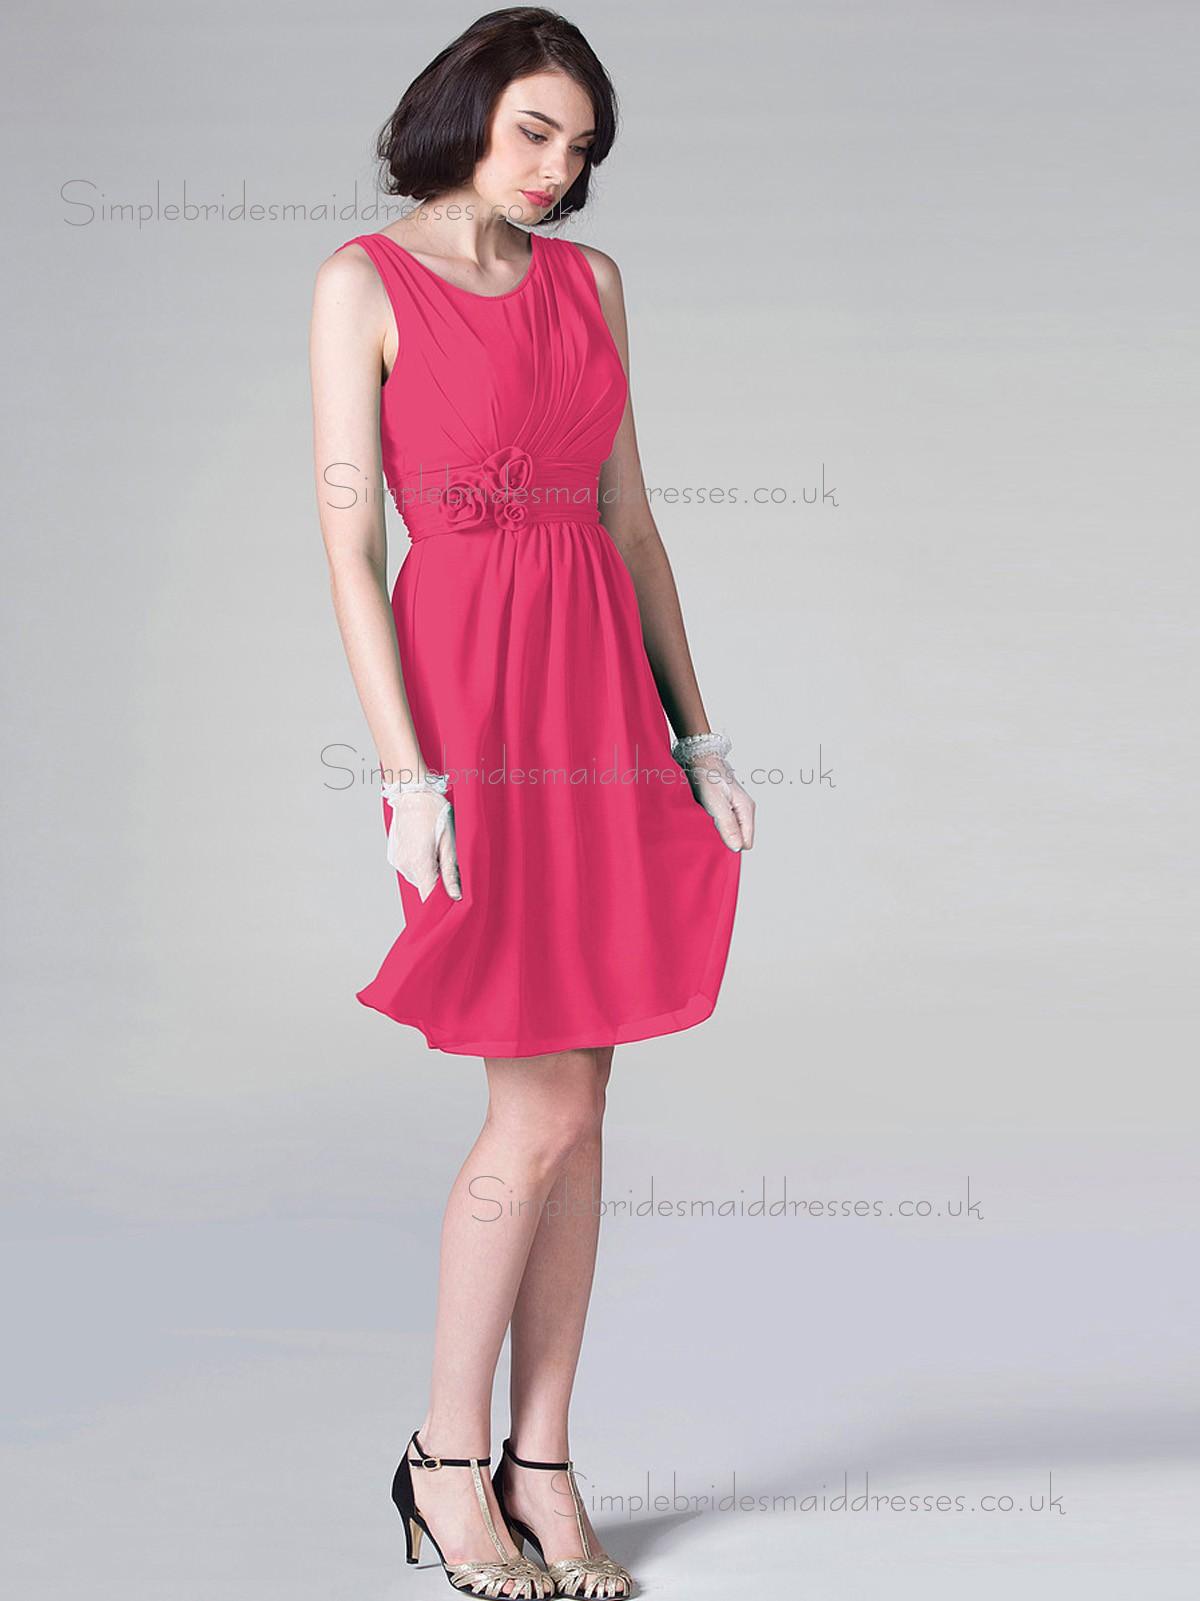 62ab44f2904 Budget Discount Short-length Hand Made Flower Hot Pink Chiffon Bridesmaid  Dresses ...